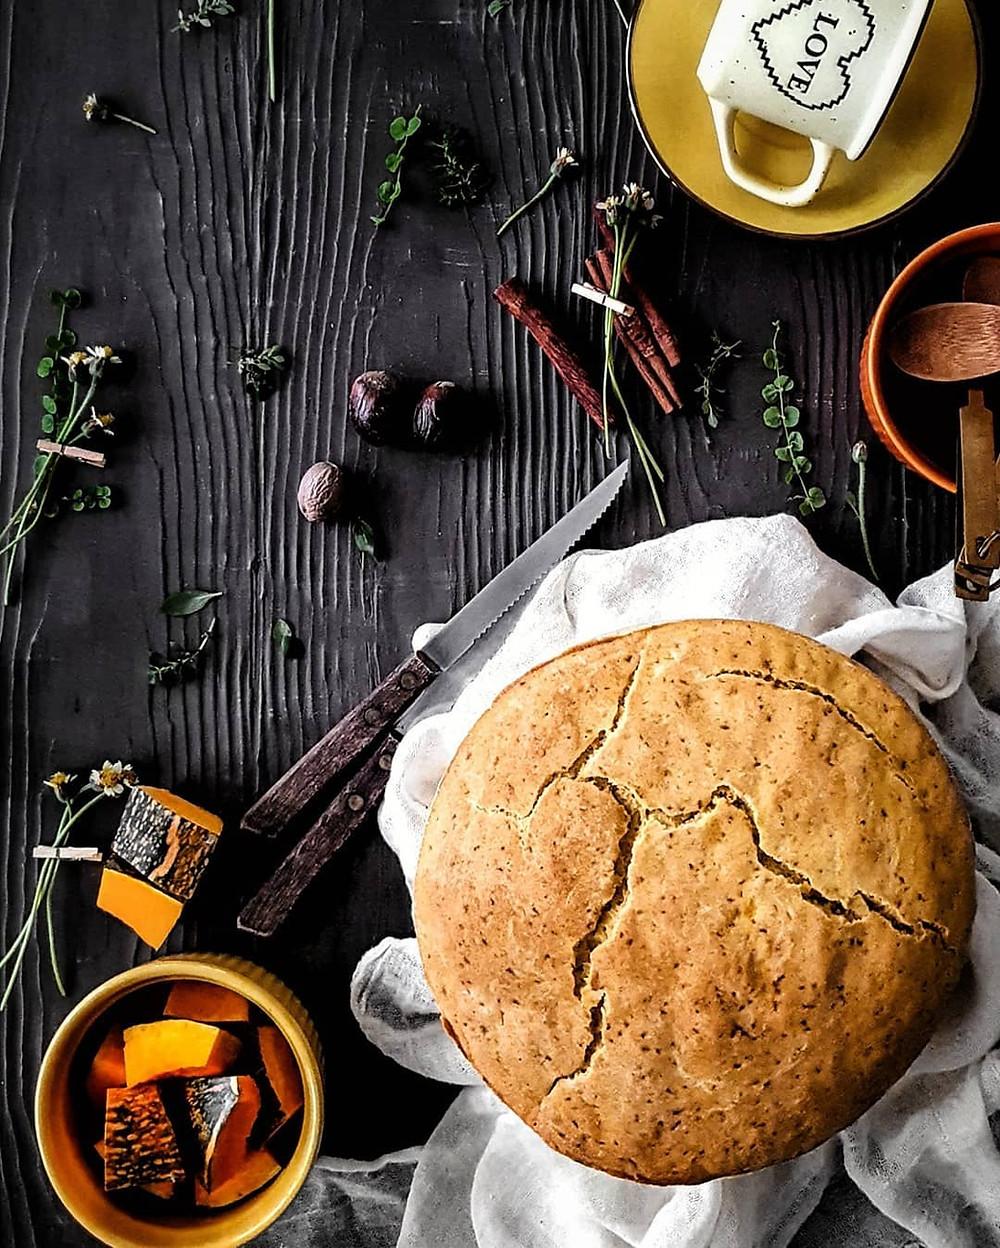 Trini Style Gluten Free and Vegan Pumpkin Bake